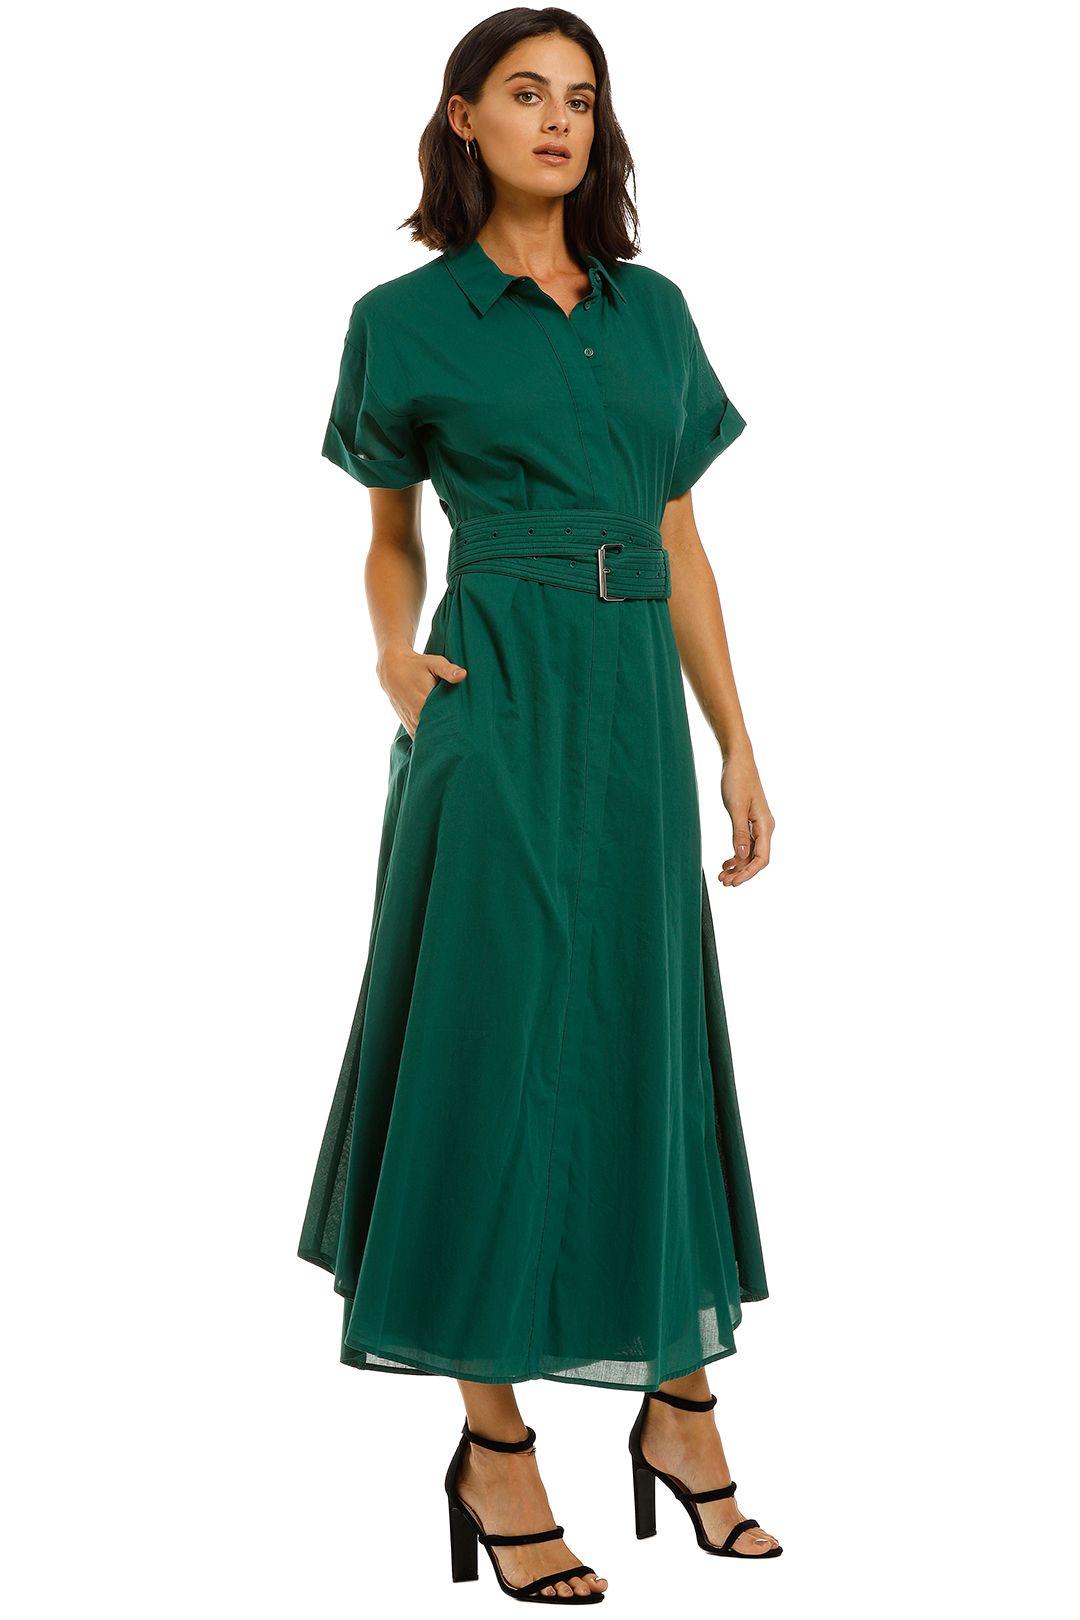 Camilla-and-Marc-Maya-Dress-Emerald-Green-Side